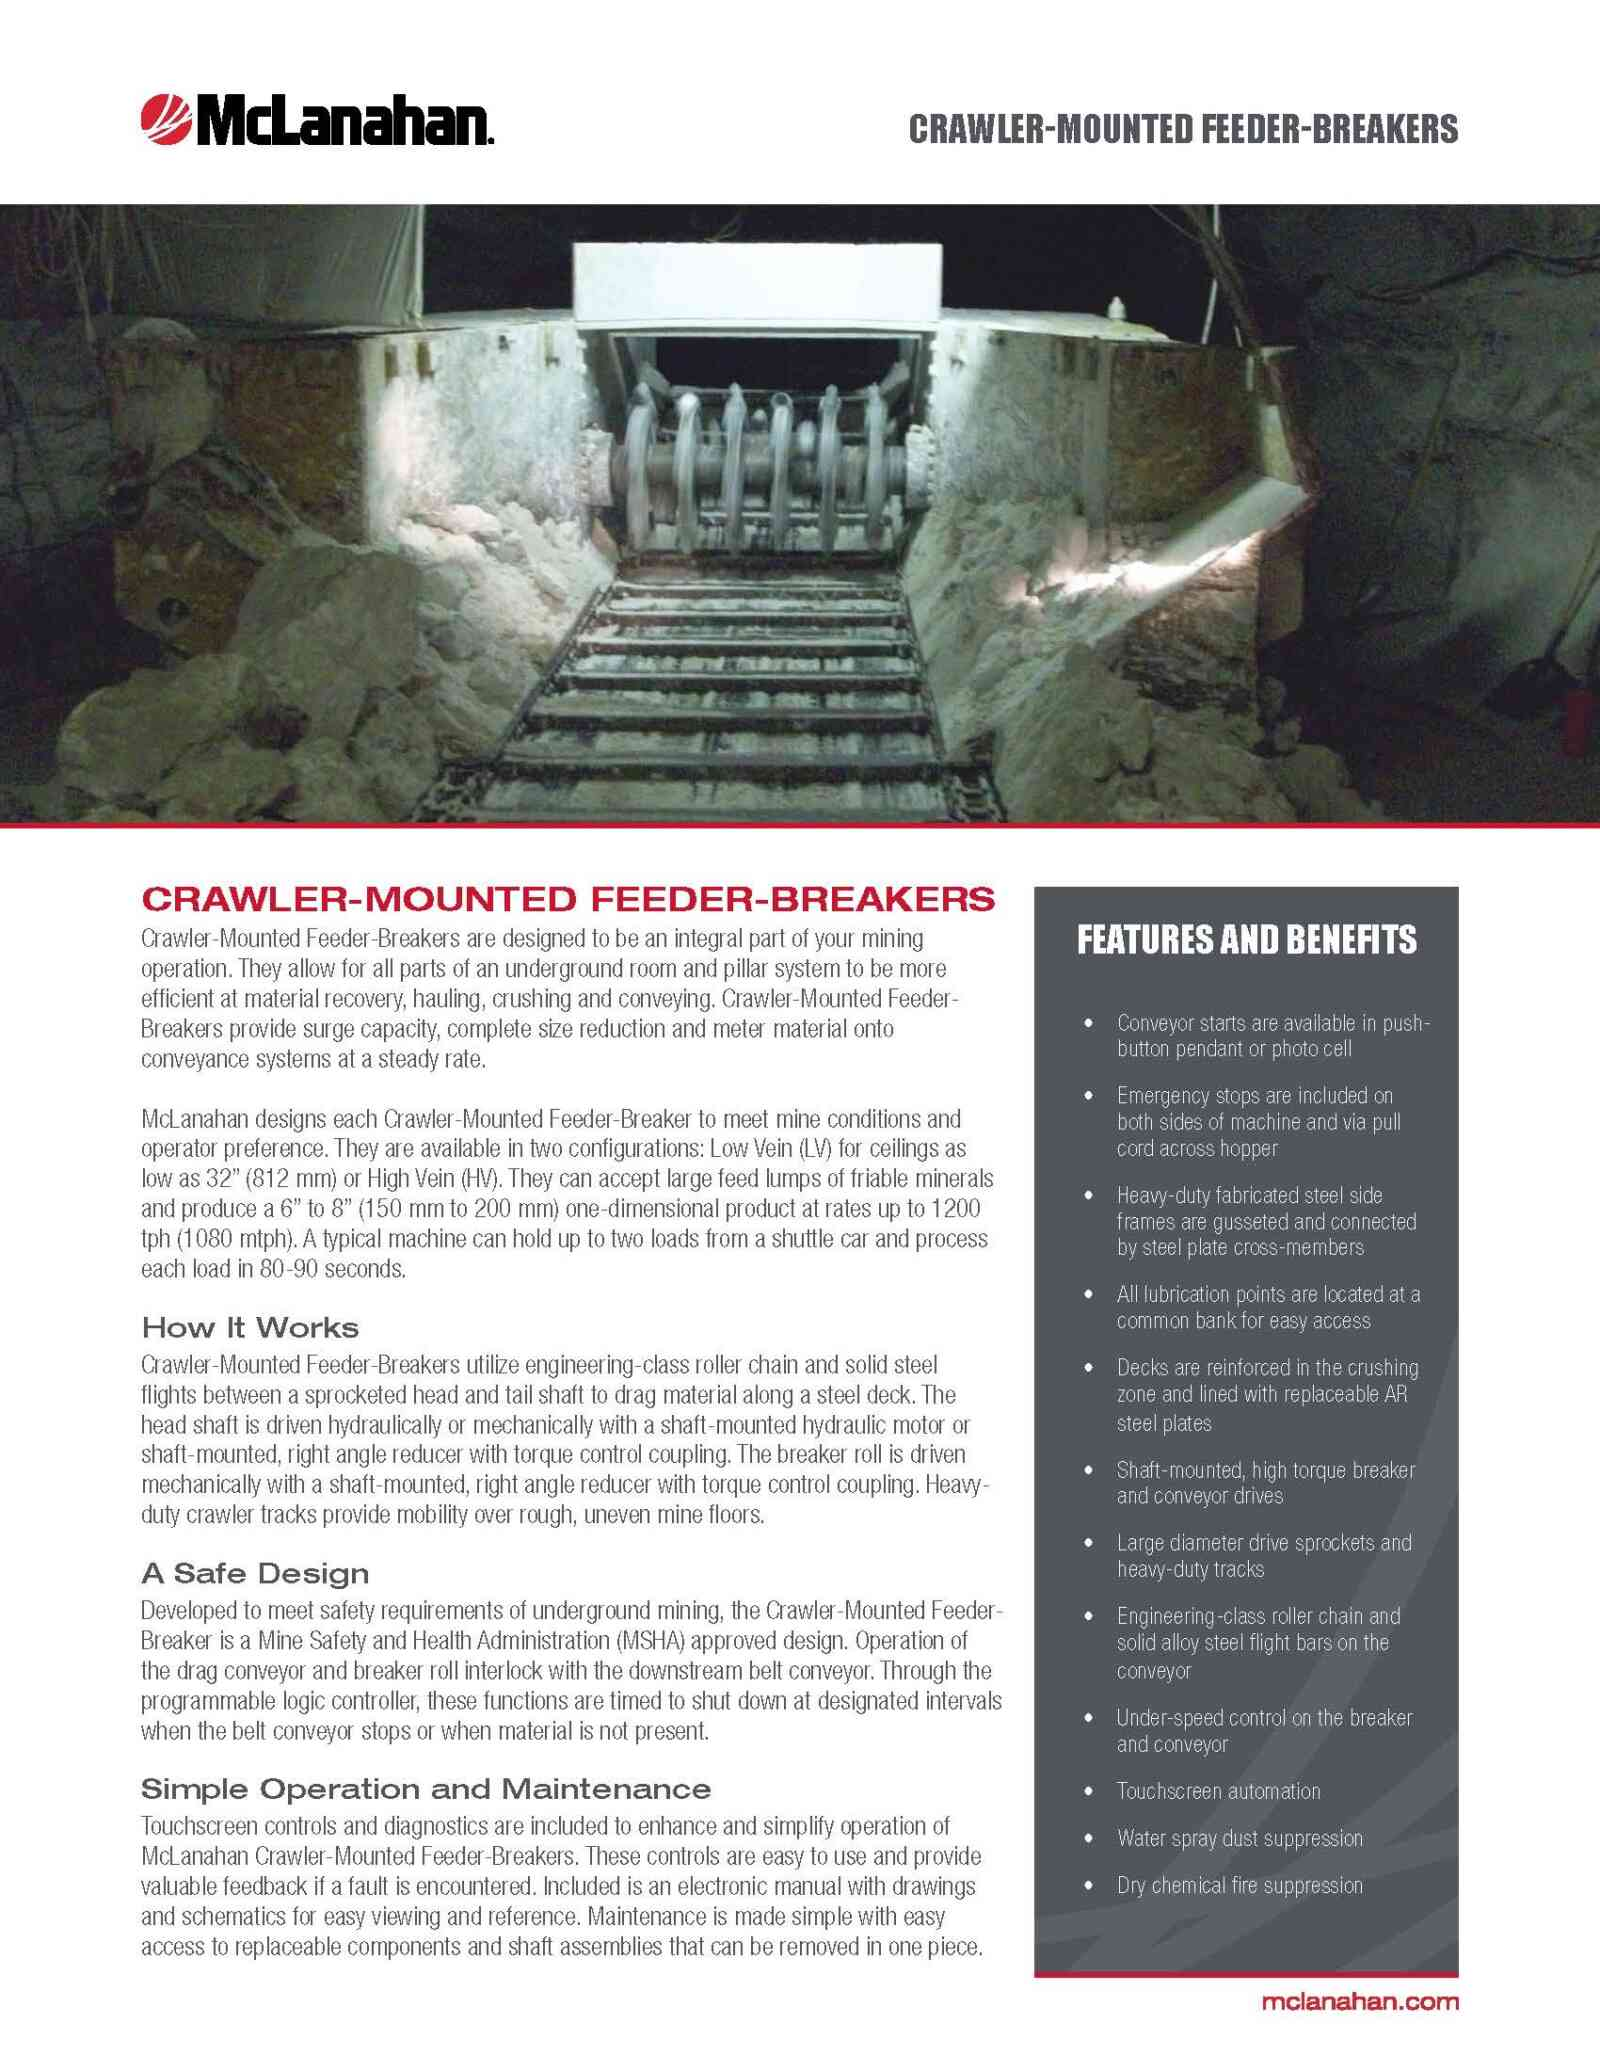 Crawler Mounted Feeder Breaker Brochure Image Page 1